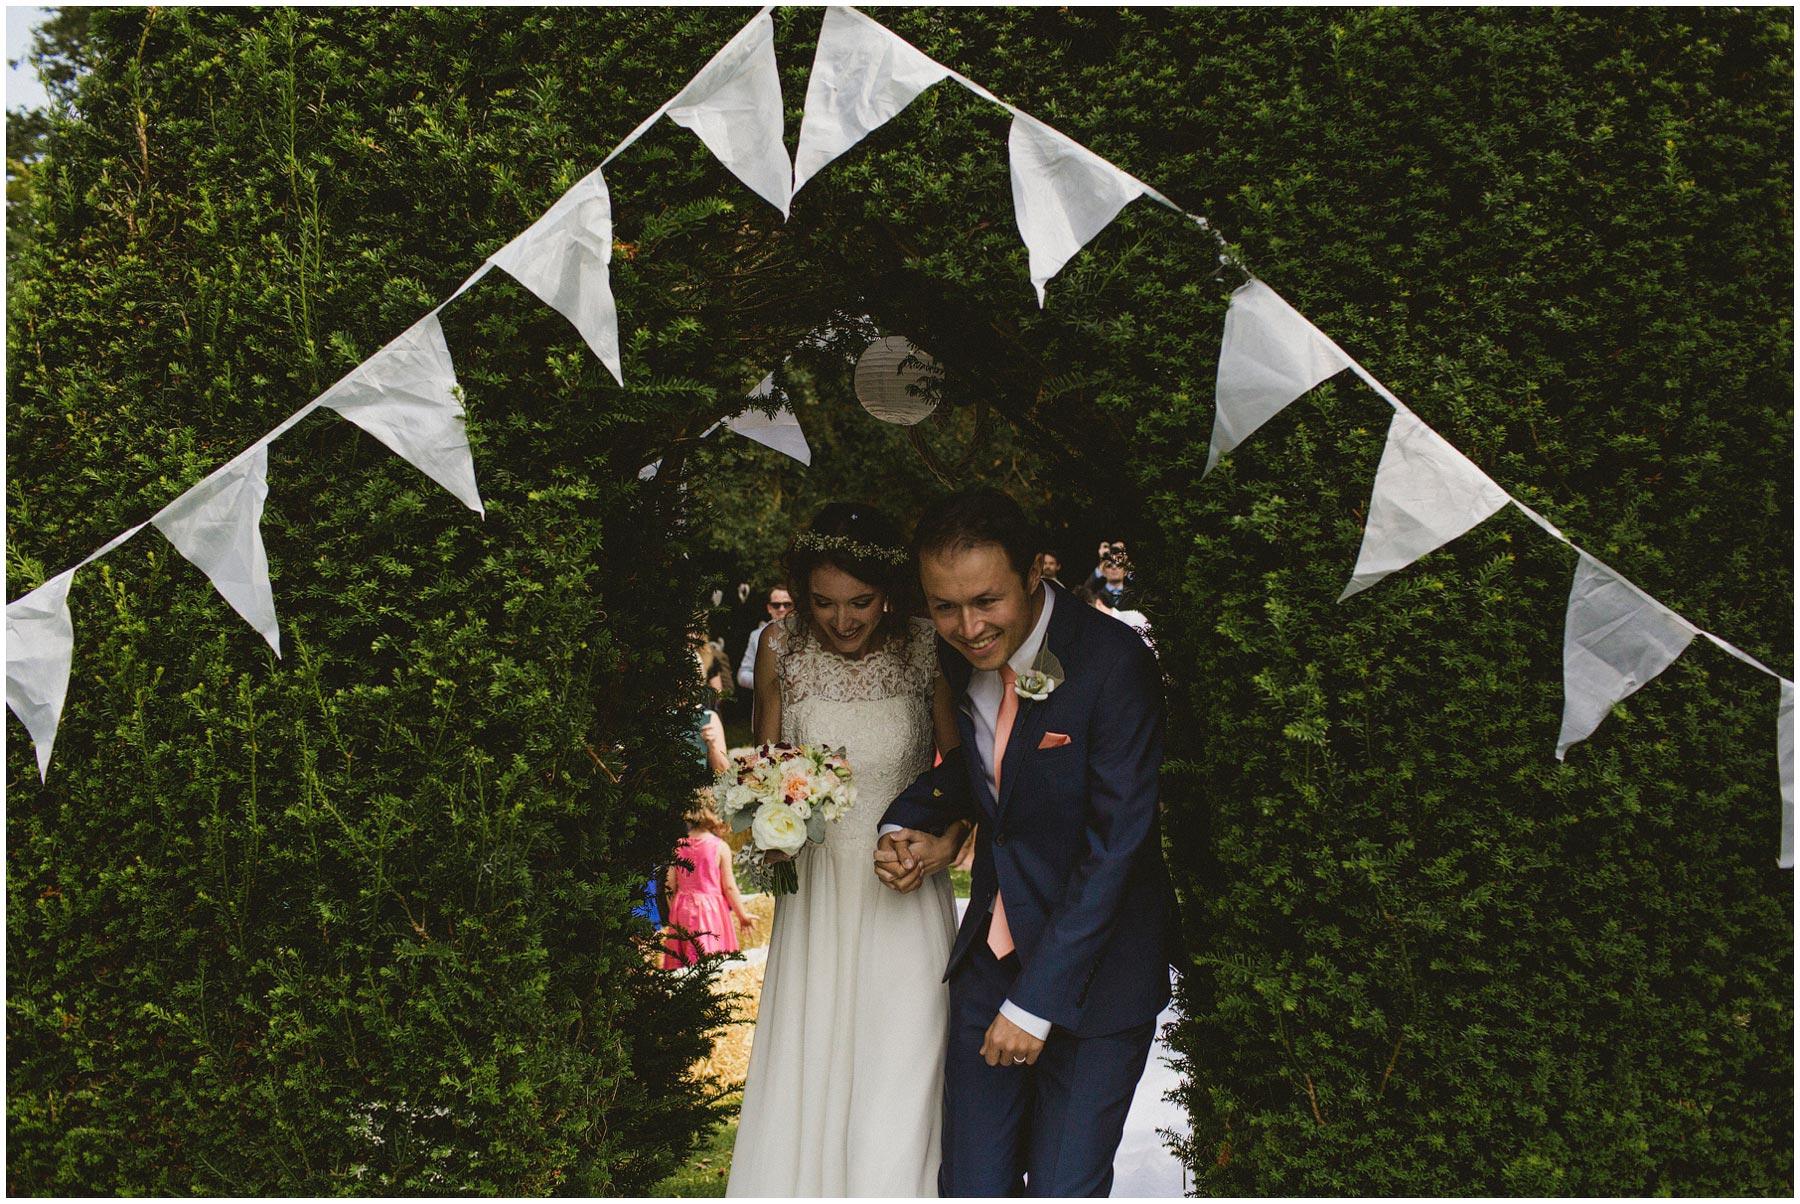 Colehayes-Park-Wedding-Photography_0096